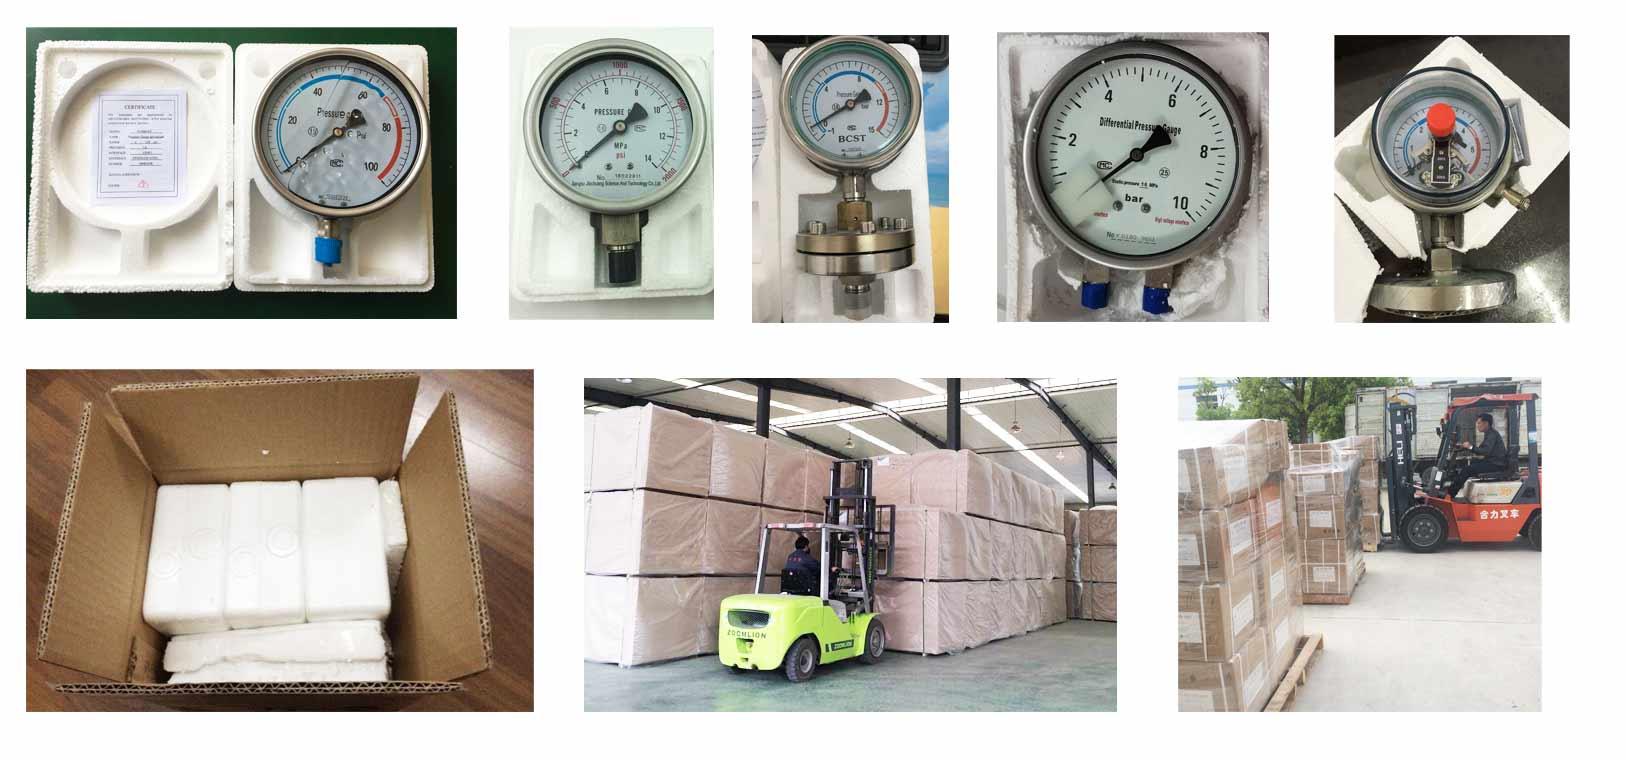 Pressure-gauge-delivery